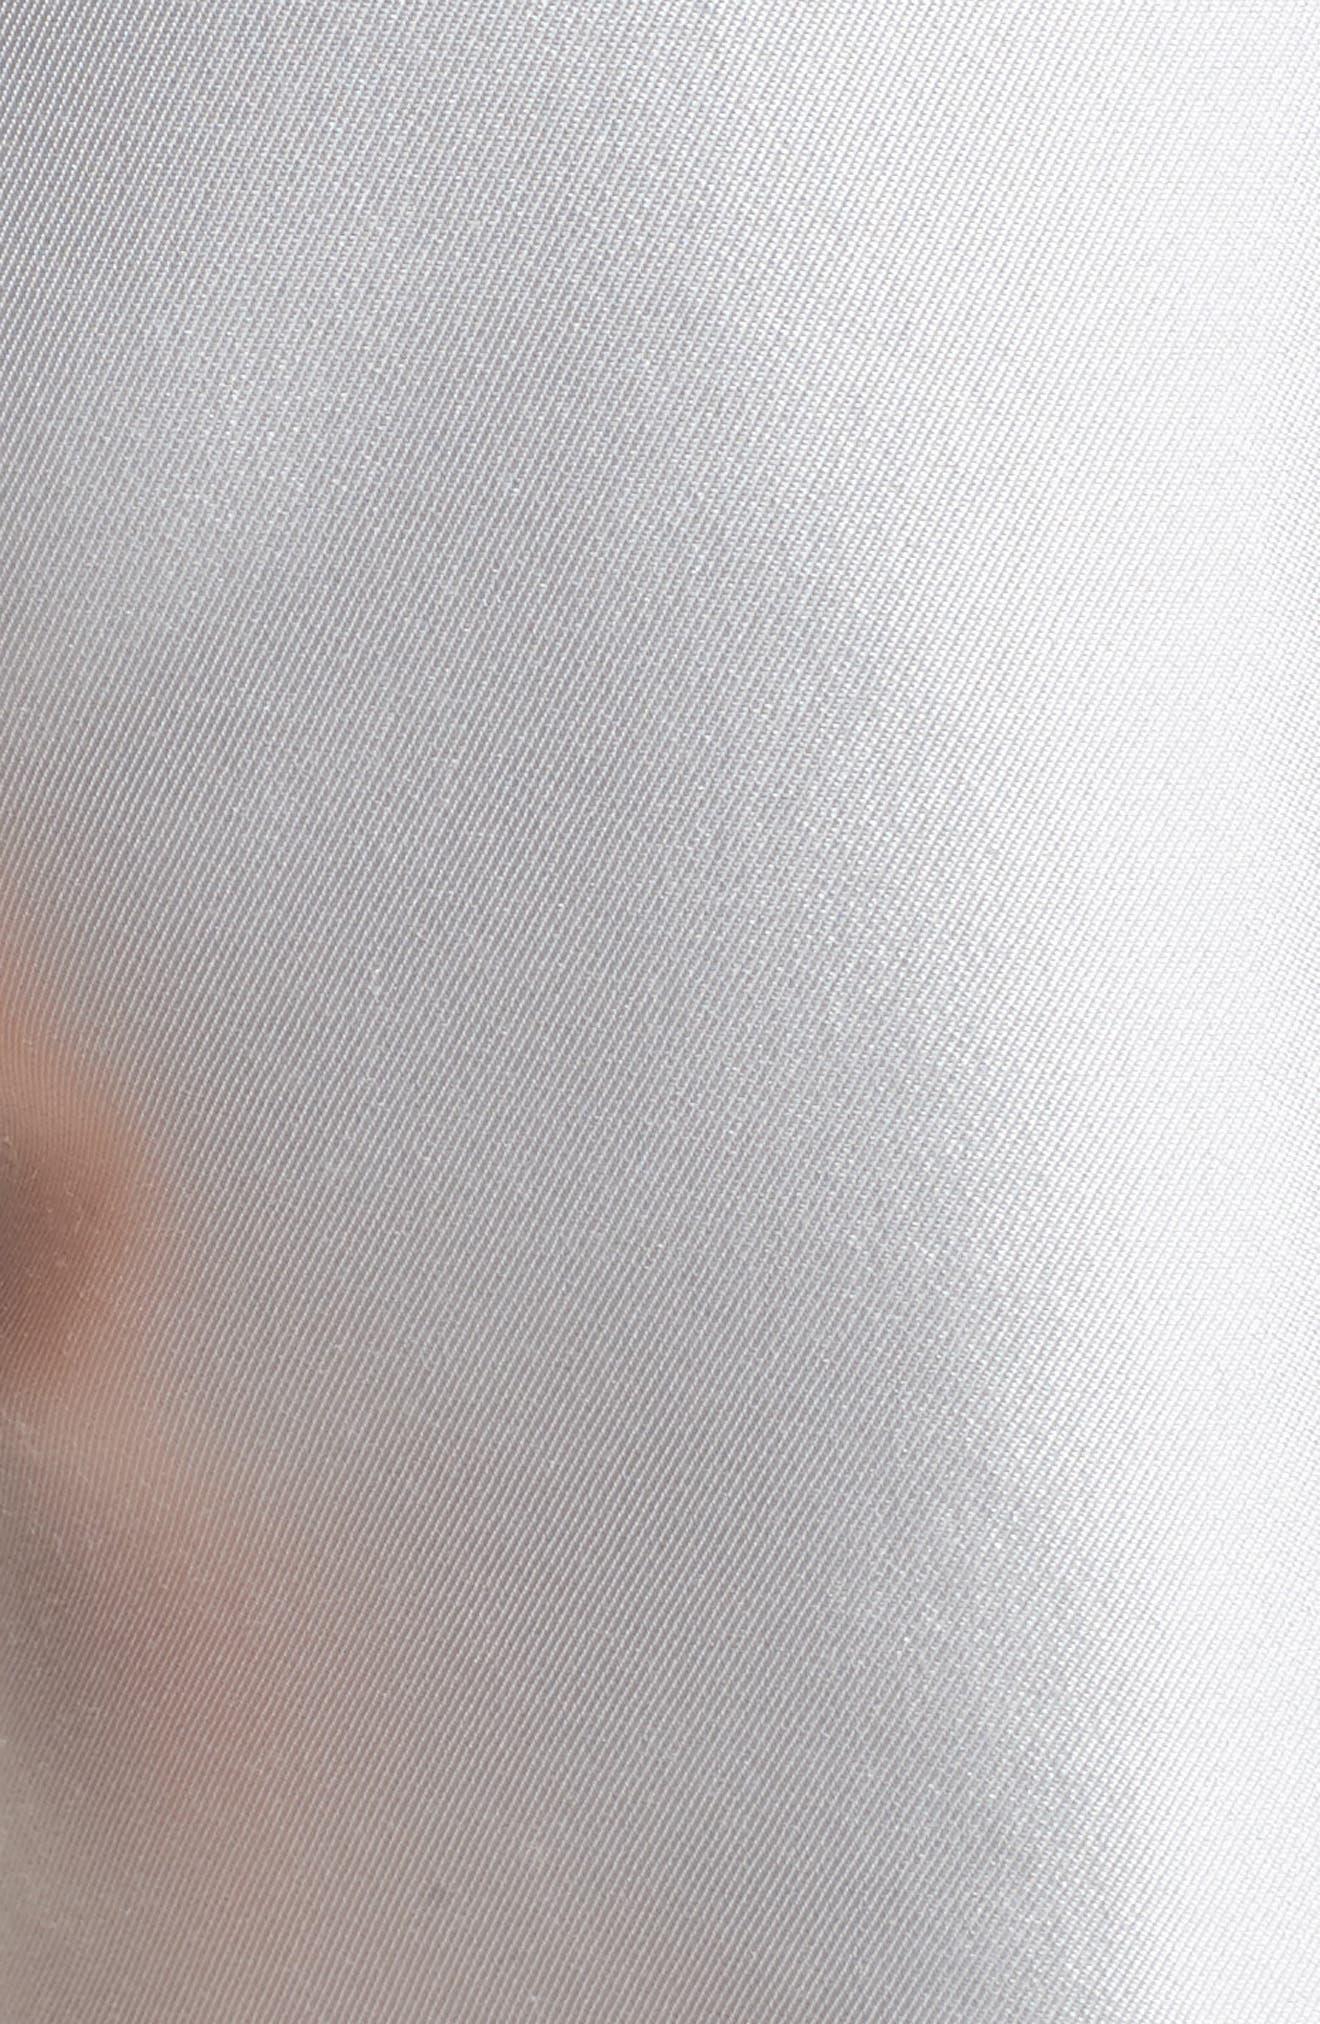 Alternate Image 3  - Rubin Singer Cap Sleeve Sheath Dress